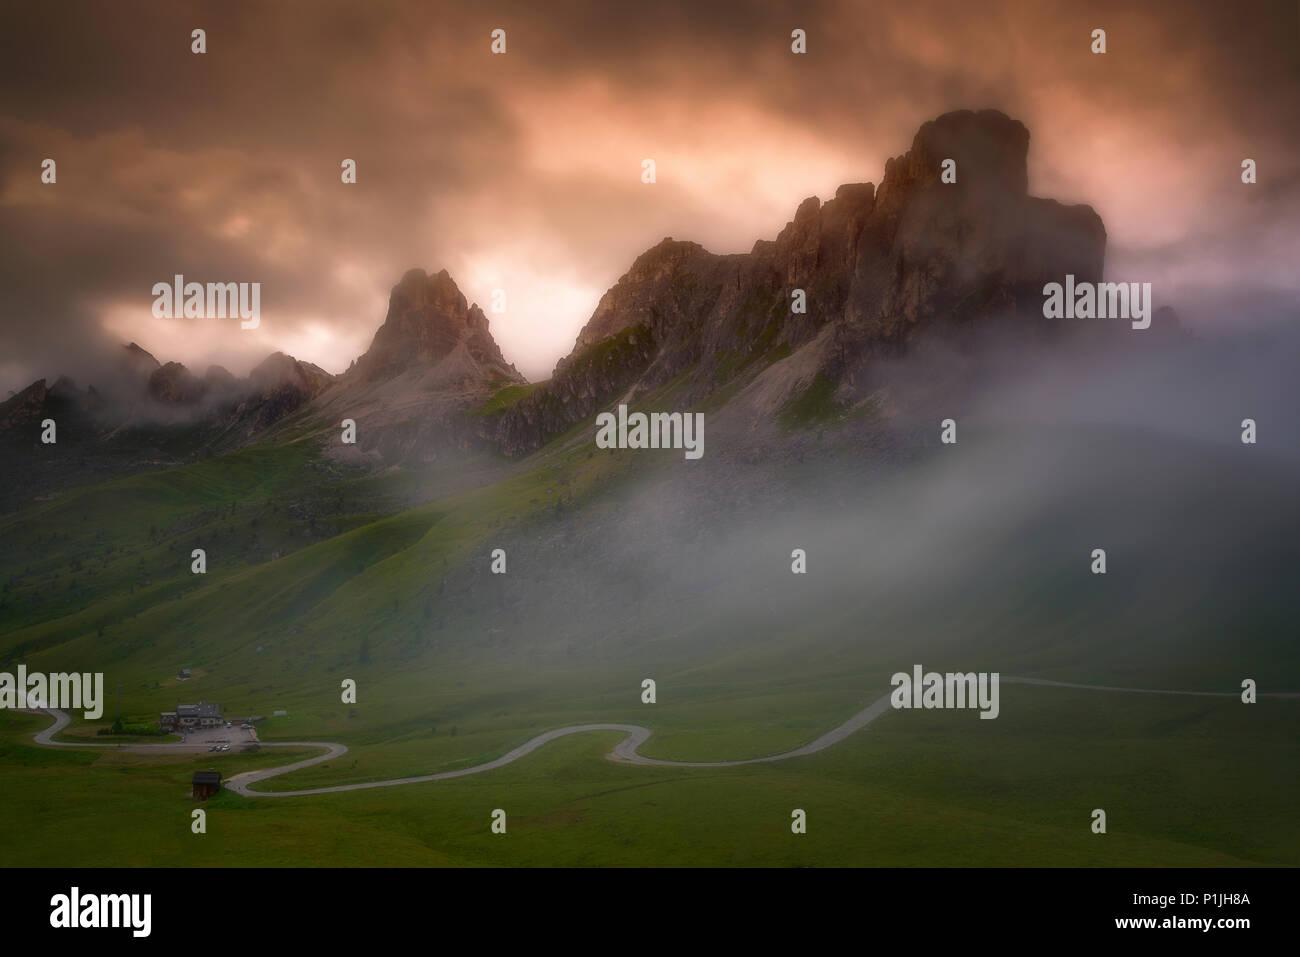 Fog at Passo di Giau in the Dolomites, district of Belluno, Italia, Europe - Stock Image